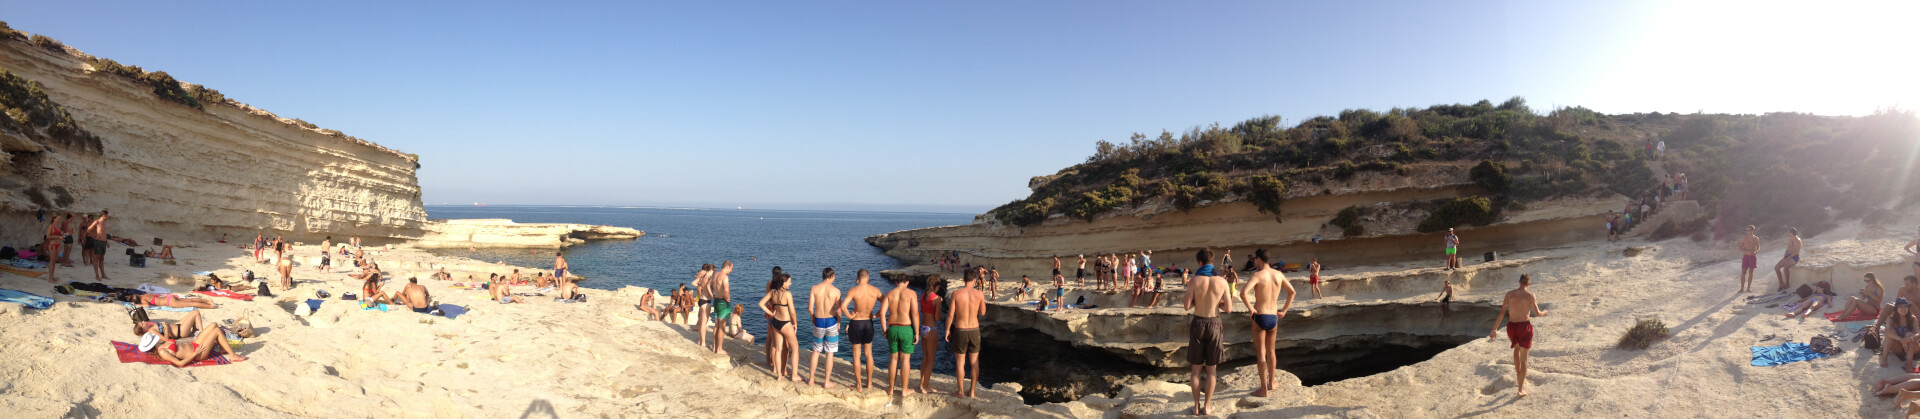 St.Peter's Pool